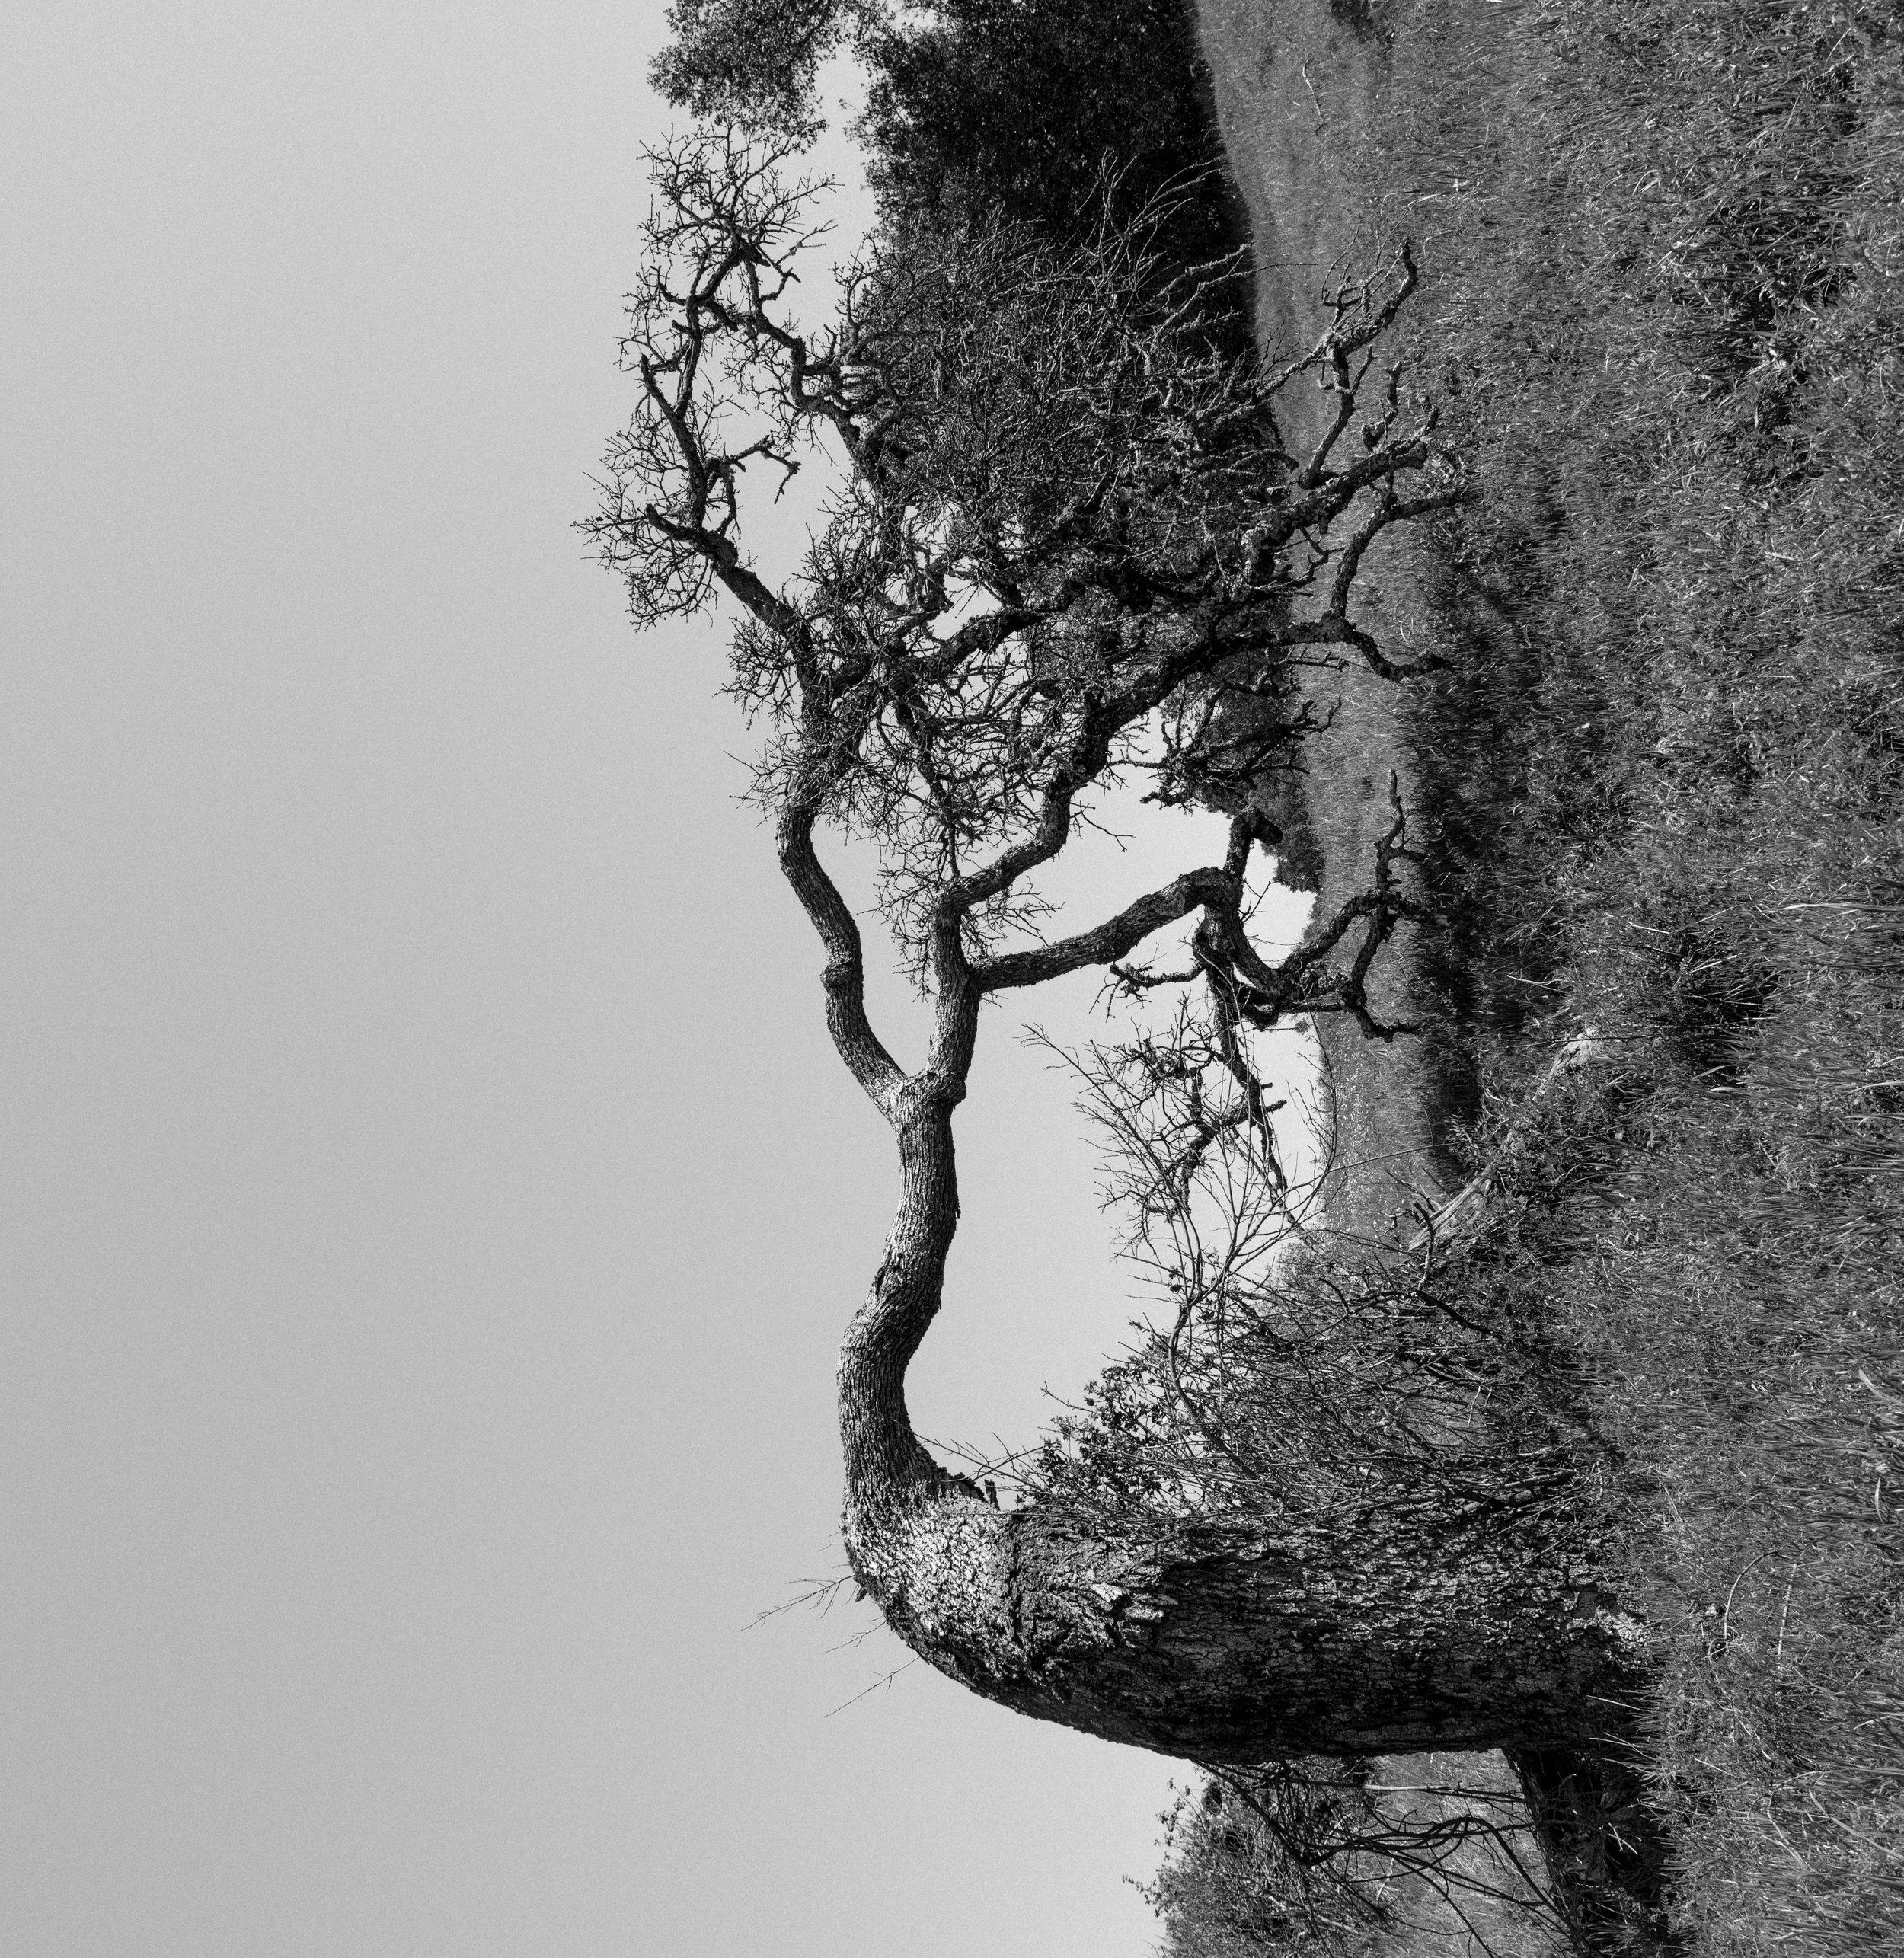 The secret tree / Napa Valley